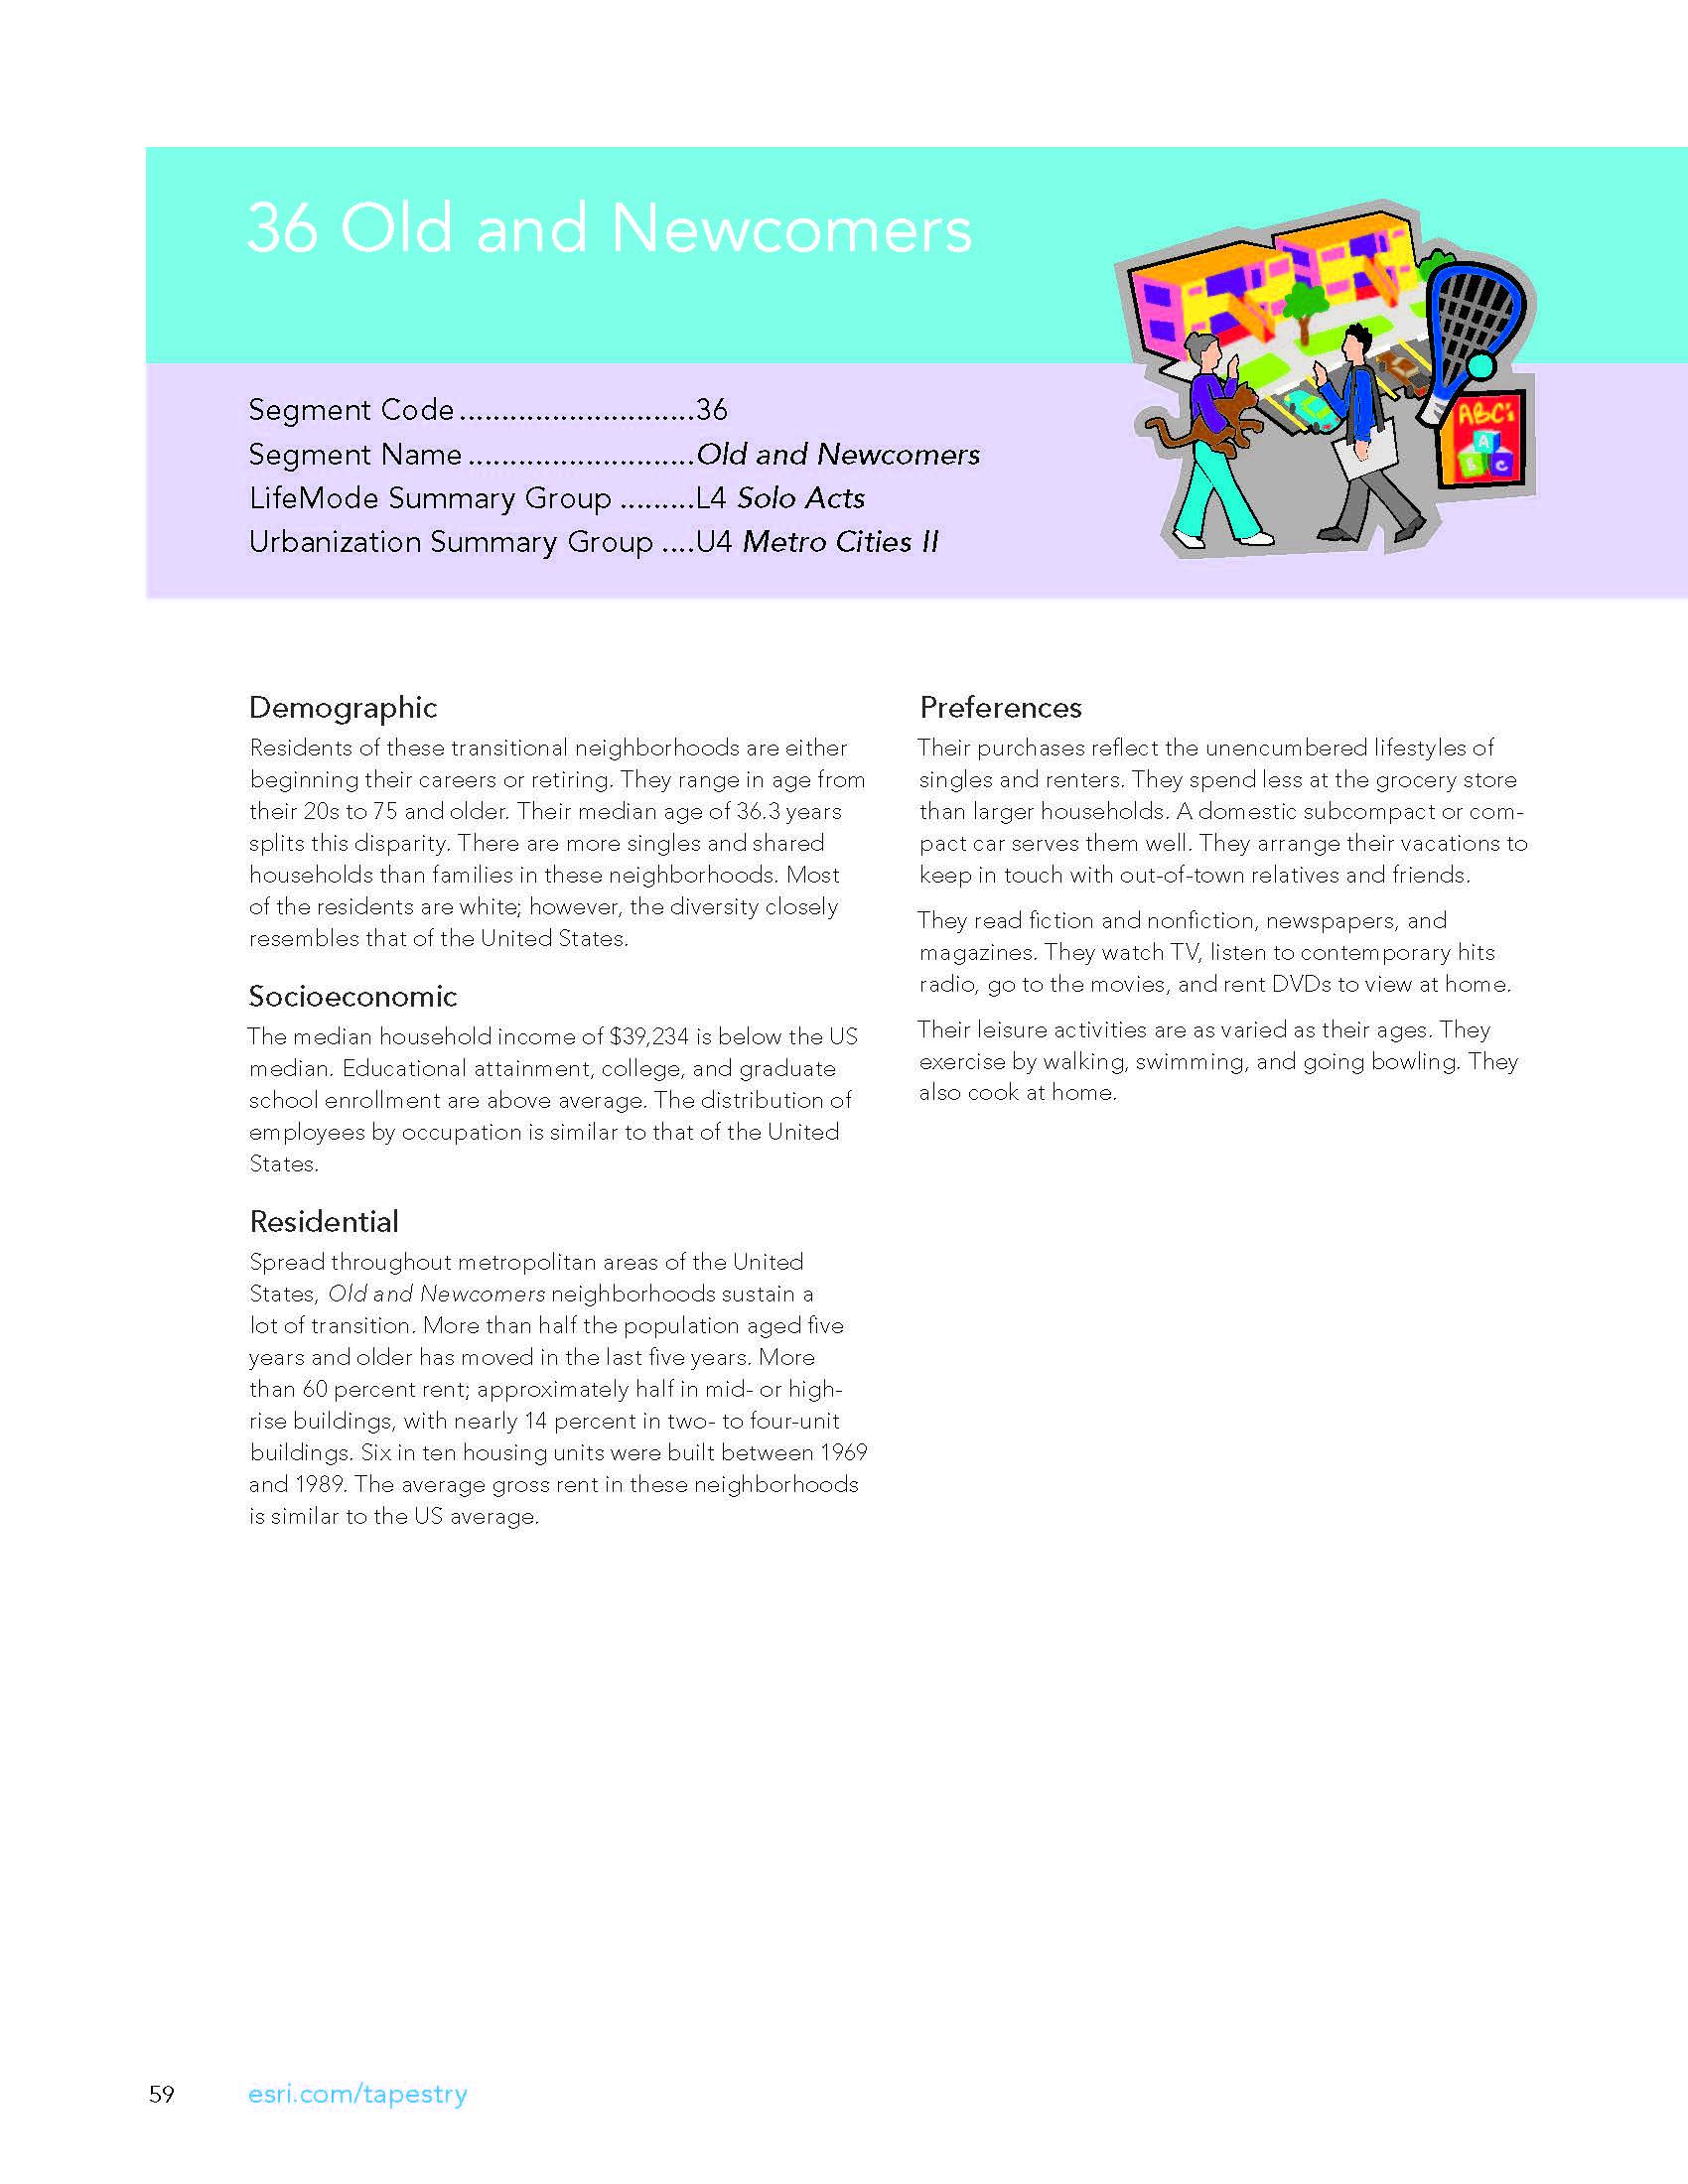 tapestry-segmentation_Page_62.jpg